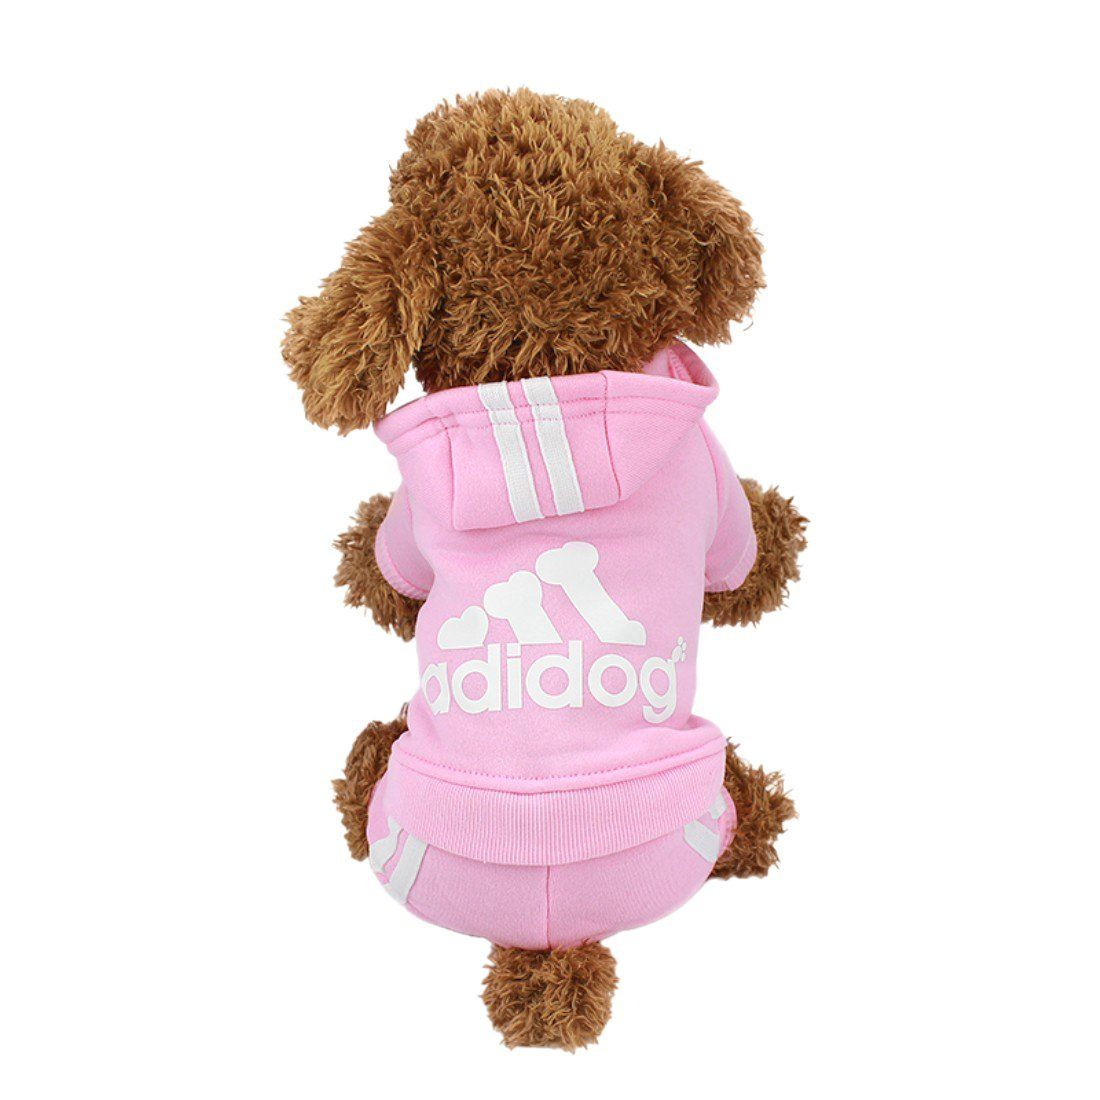 Amazon Com Idepet Tm Adidog Pet Dog Cat Clothes 4 Legs Cotton Puppy Hoodies Coat Sweater Costumes Dog Jacket S Pink Dog Sweaters Cat Clothes Pet Clothes [ 1100 x 1100 Pixel ]